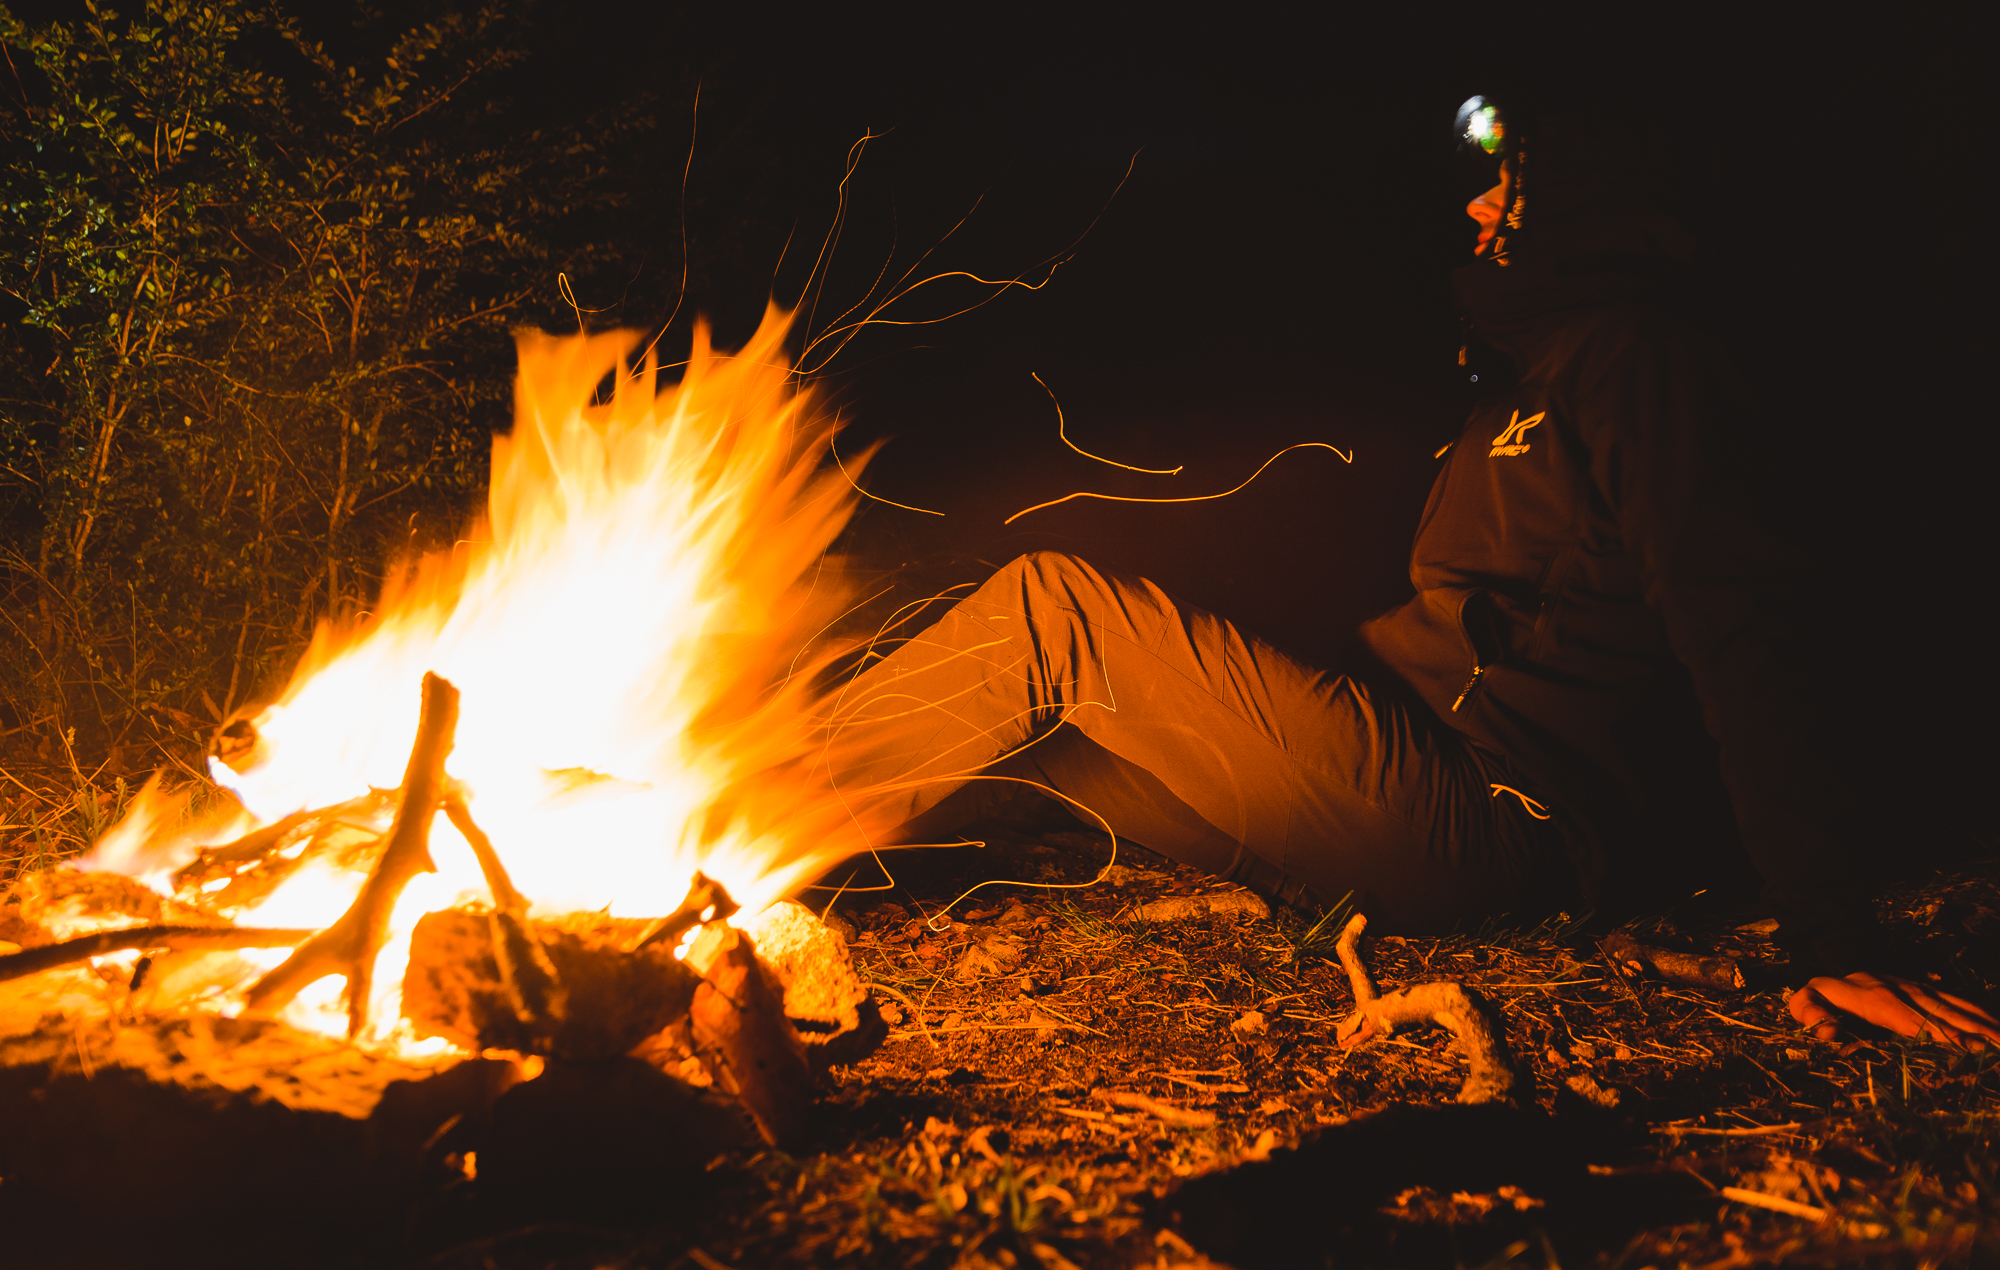 camping content creator